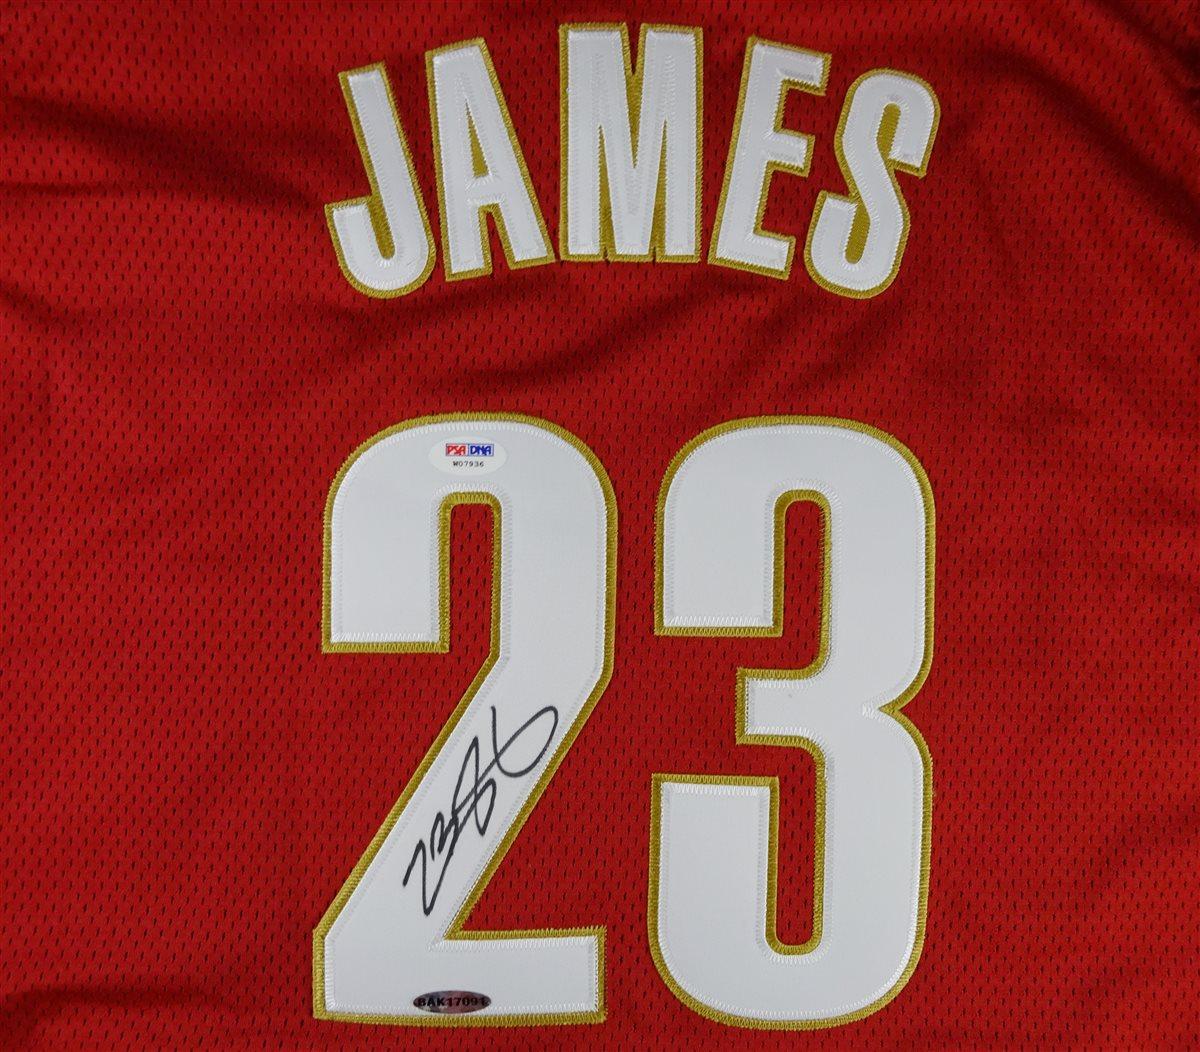 lebron james autographed jersey